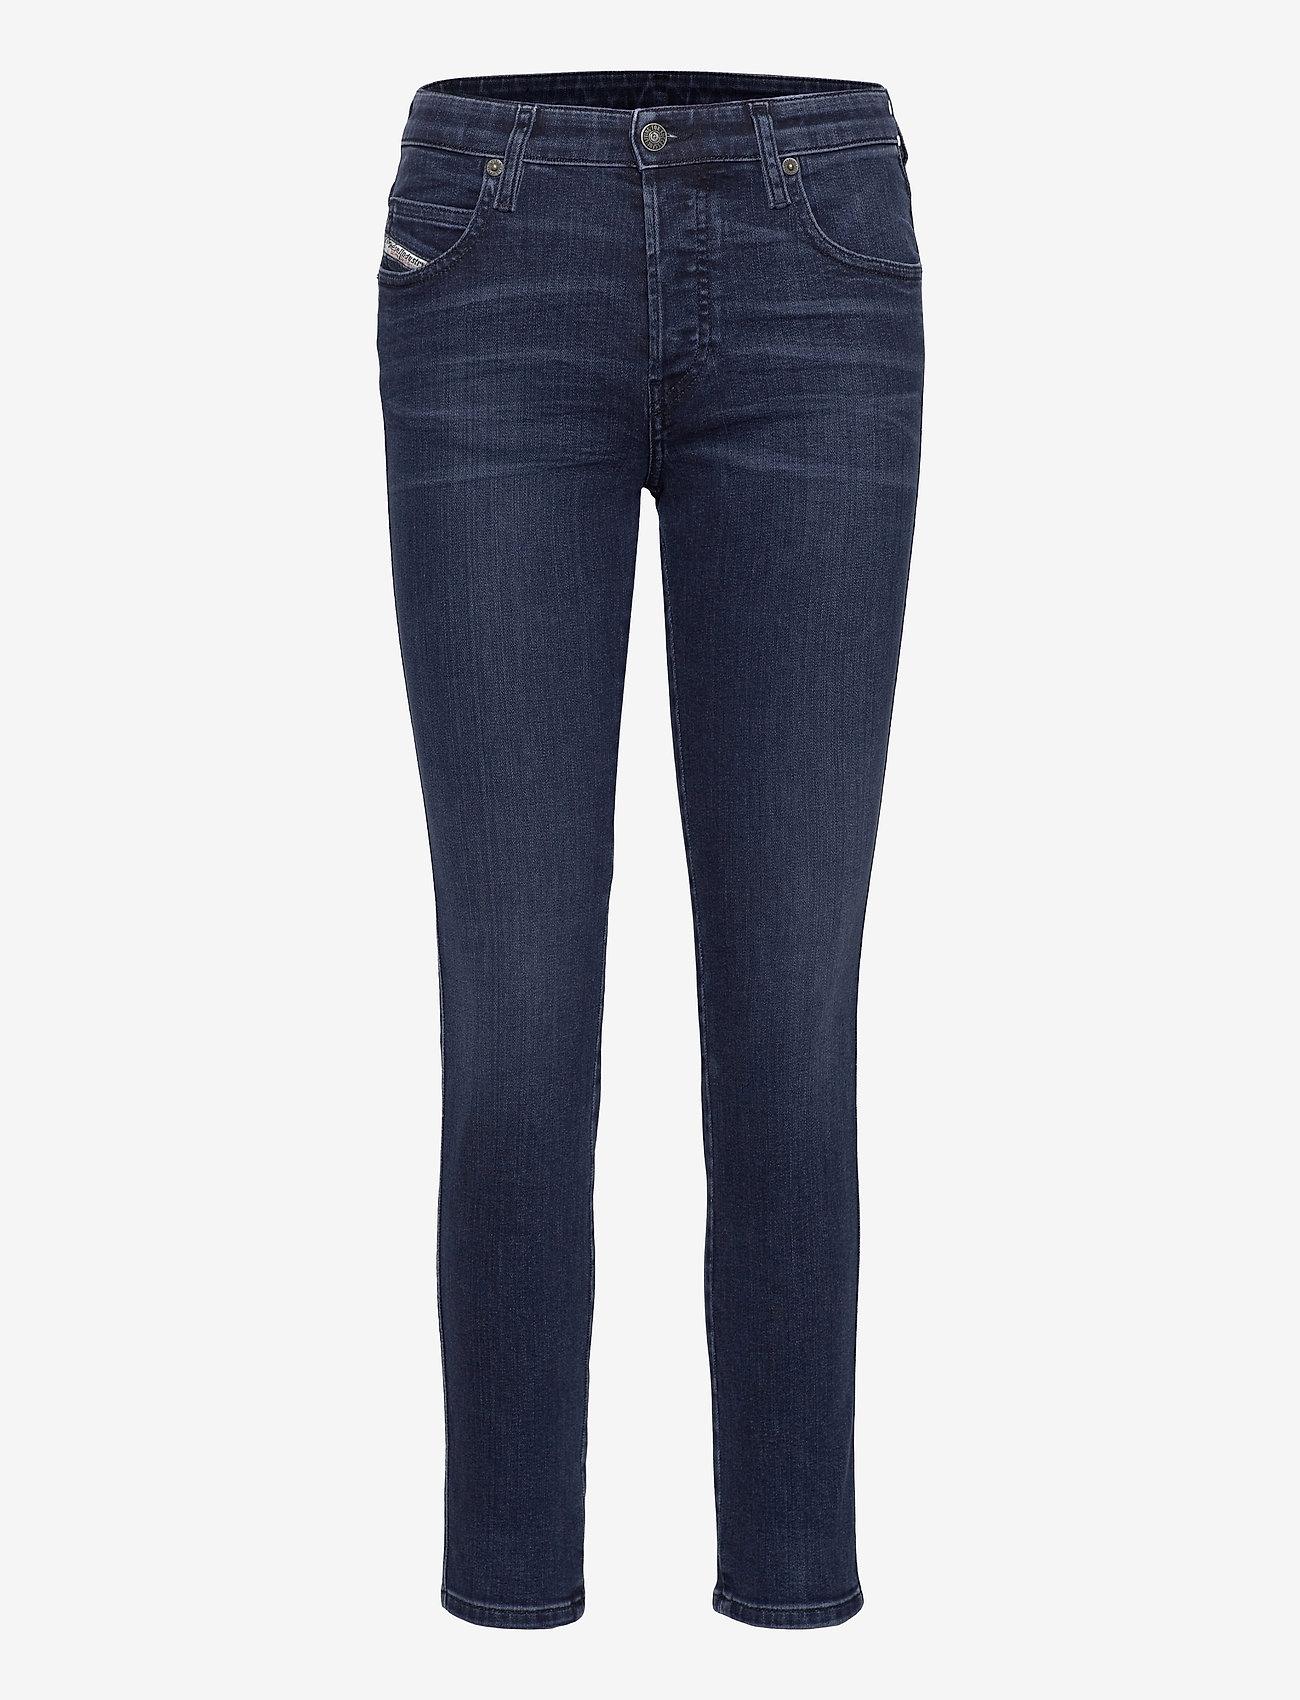 Diesel Women - BABHILA TROUSERS - slim jeans - denim - 0